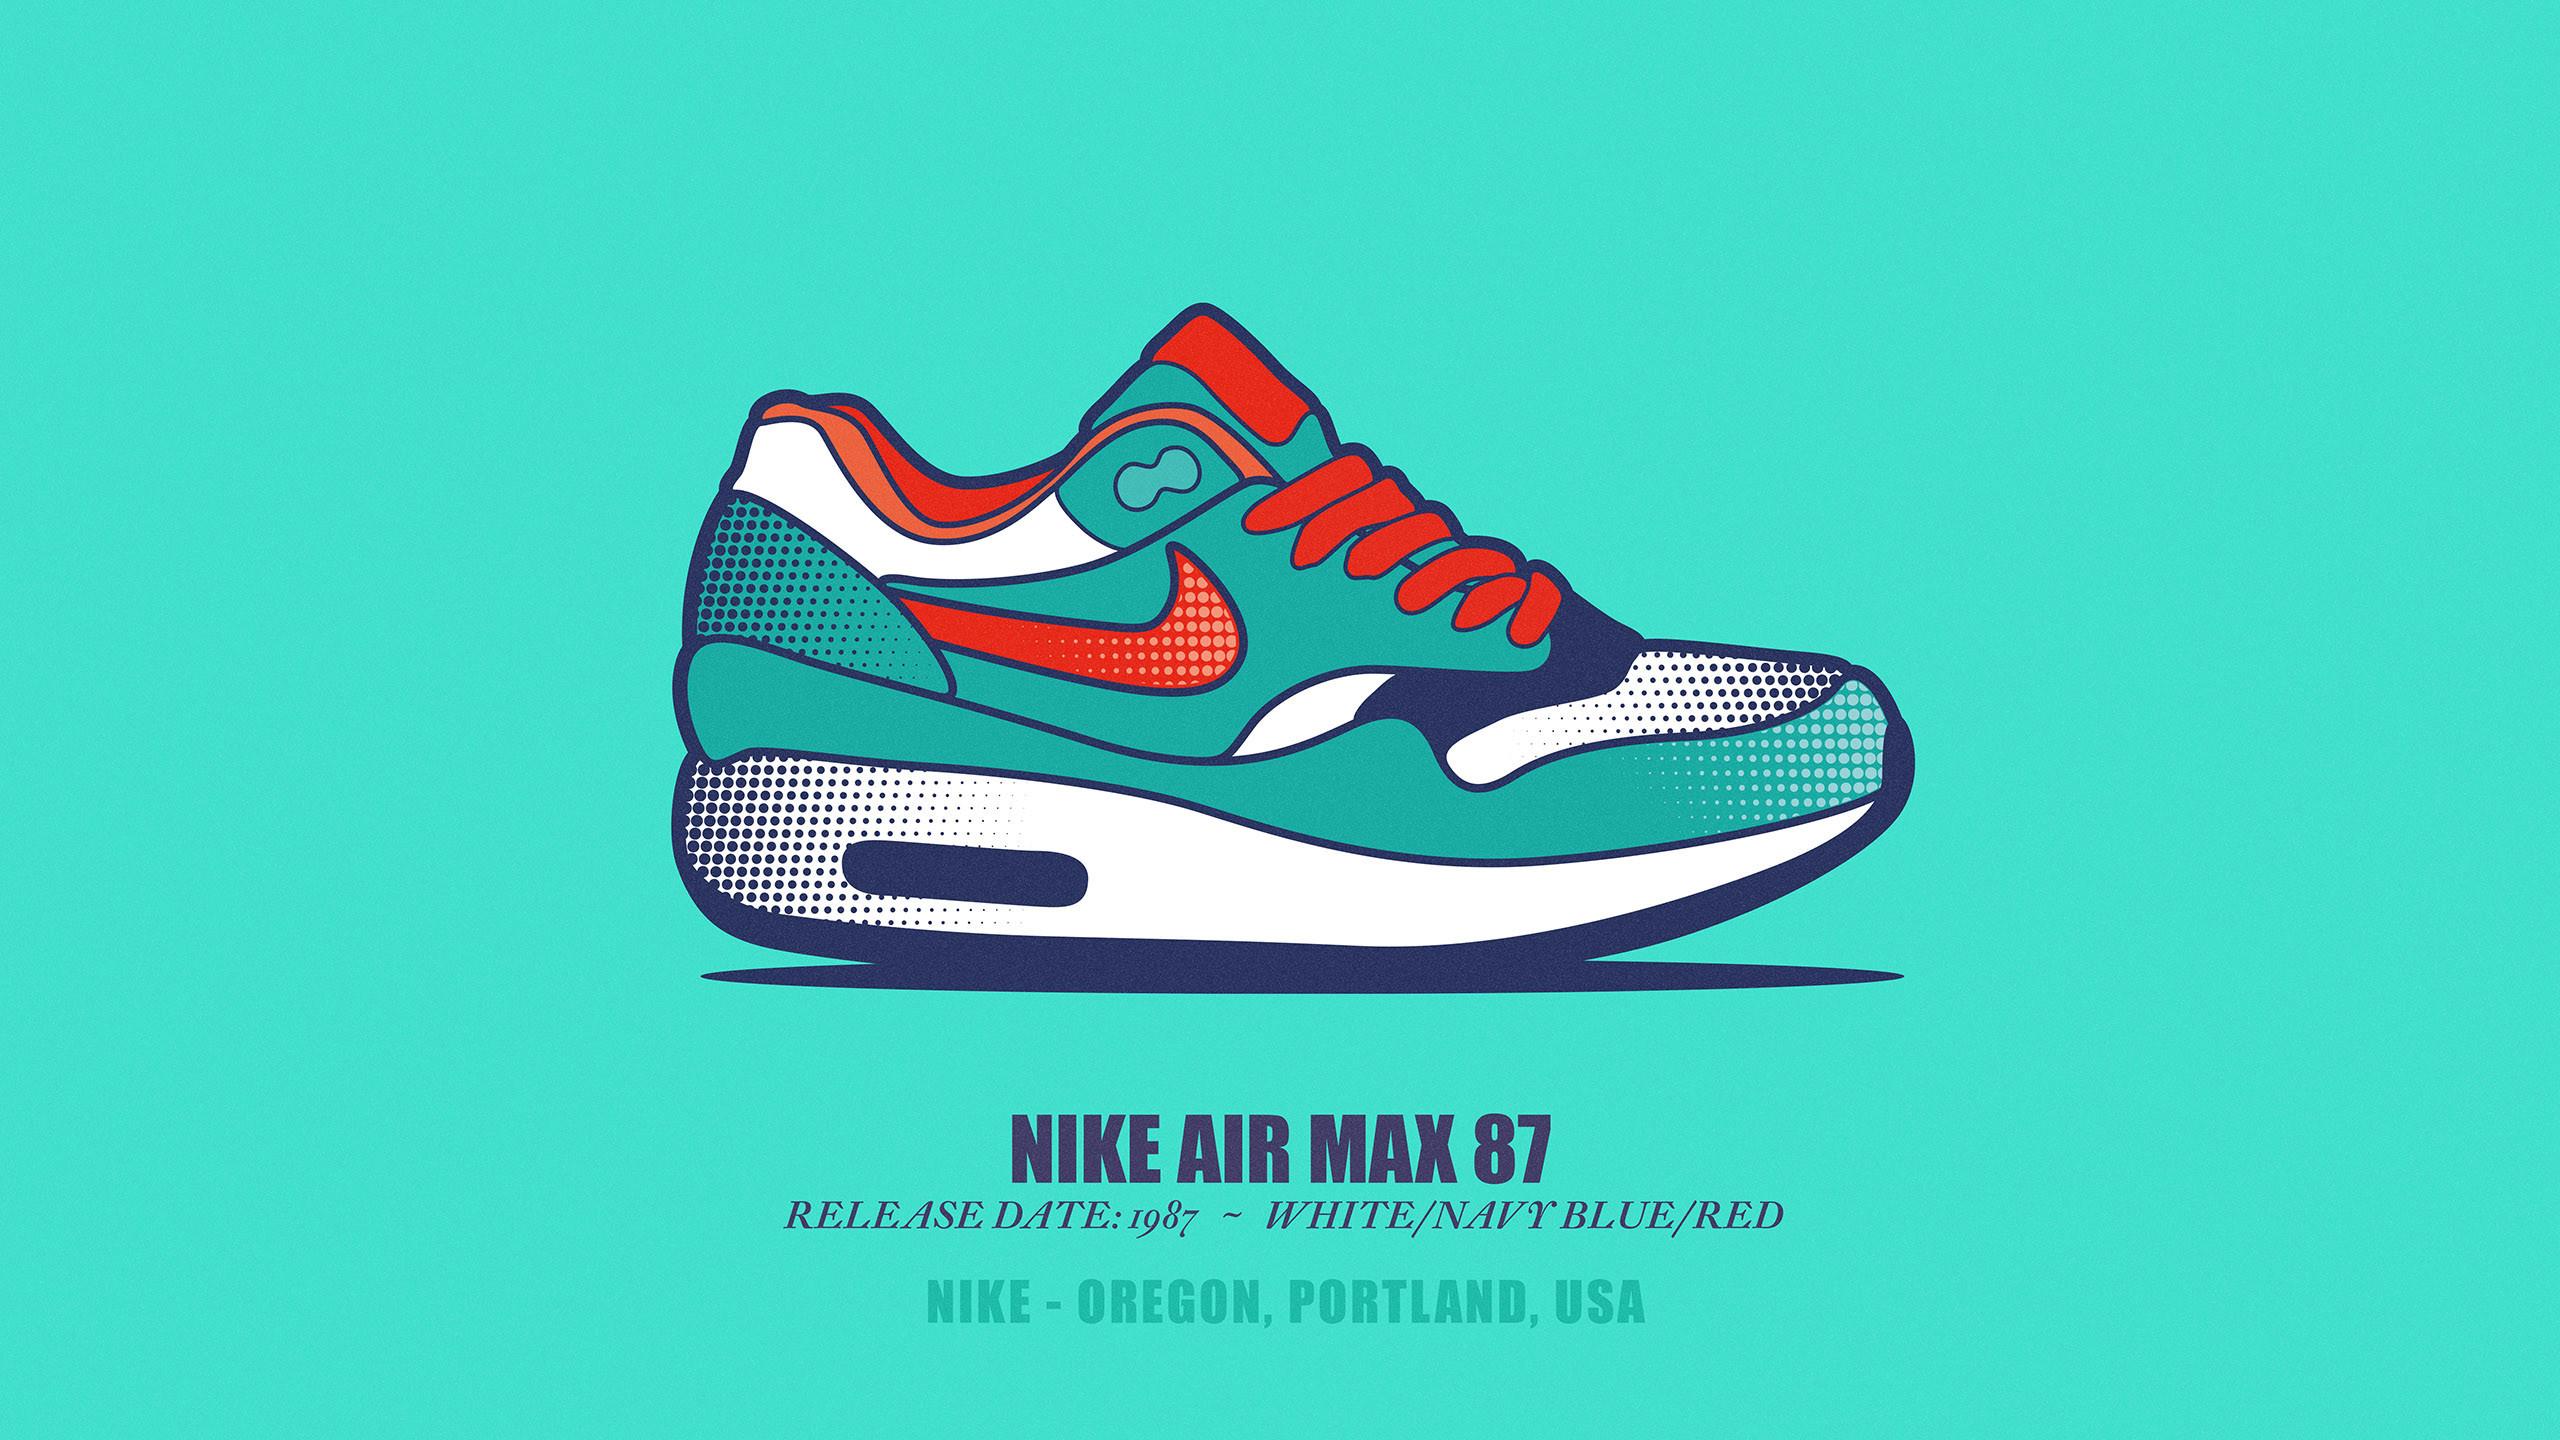 SneakerHDWallpapers.com – Your favorite sneakers in HD and ... |Foamposites Wallpaper Hd